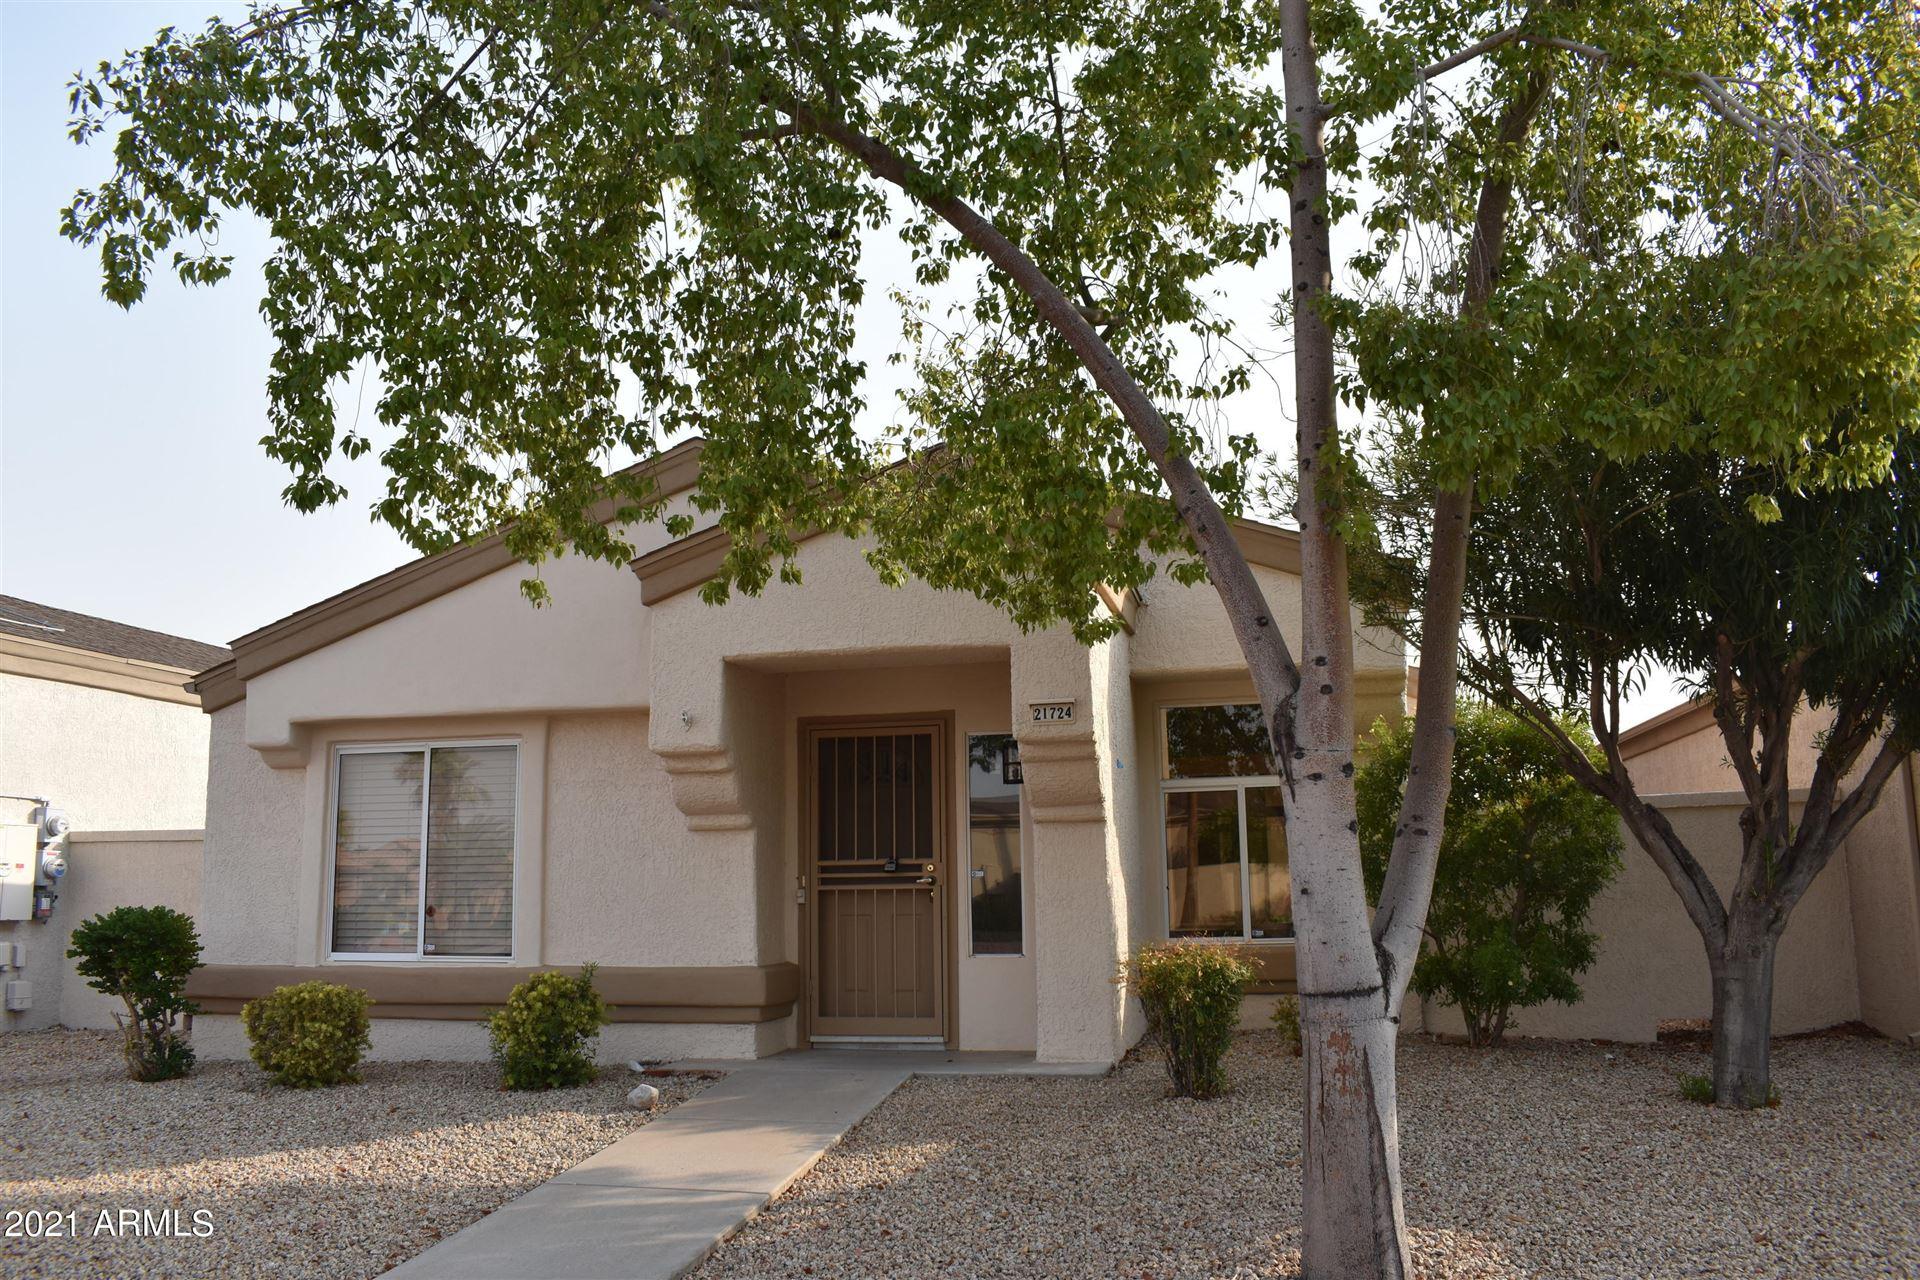 Photo of 21724 N VERDE RIDGE Drive, Sun City West, AZ 85375 (MLS # 6271563)